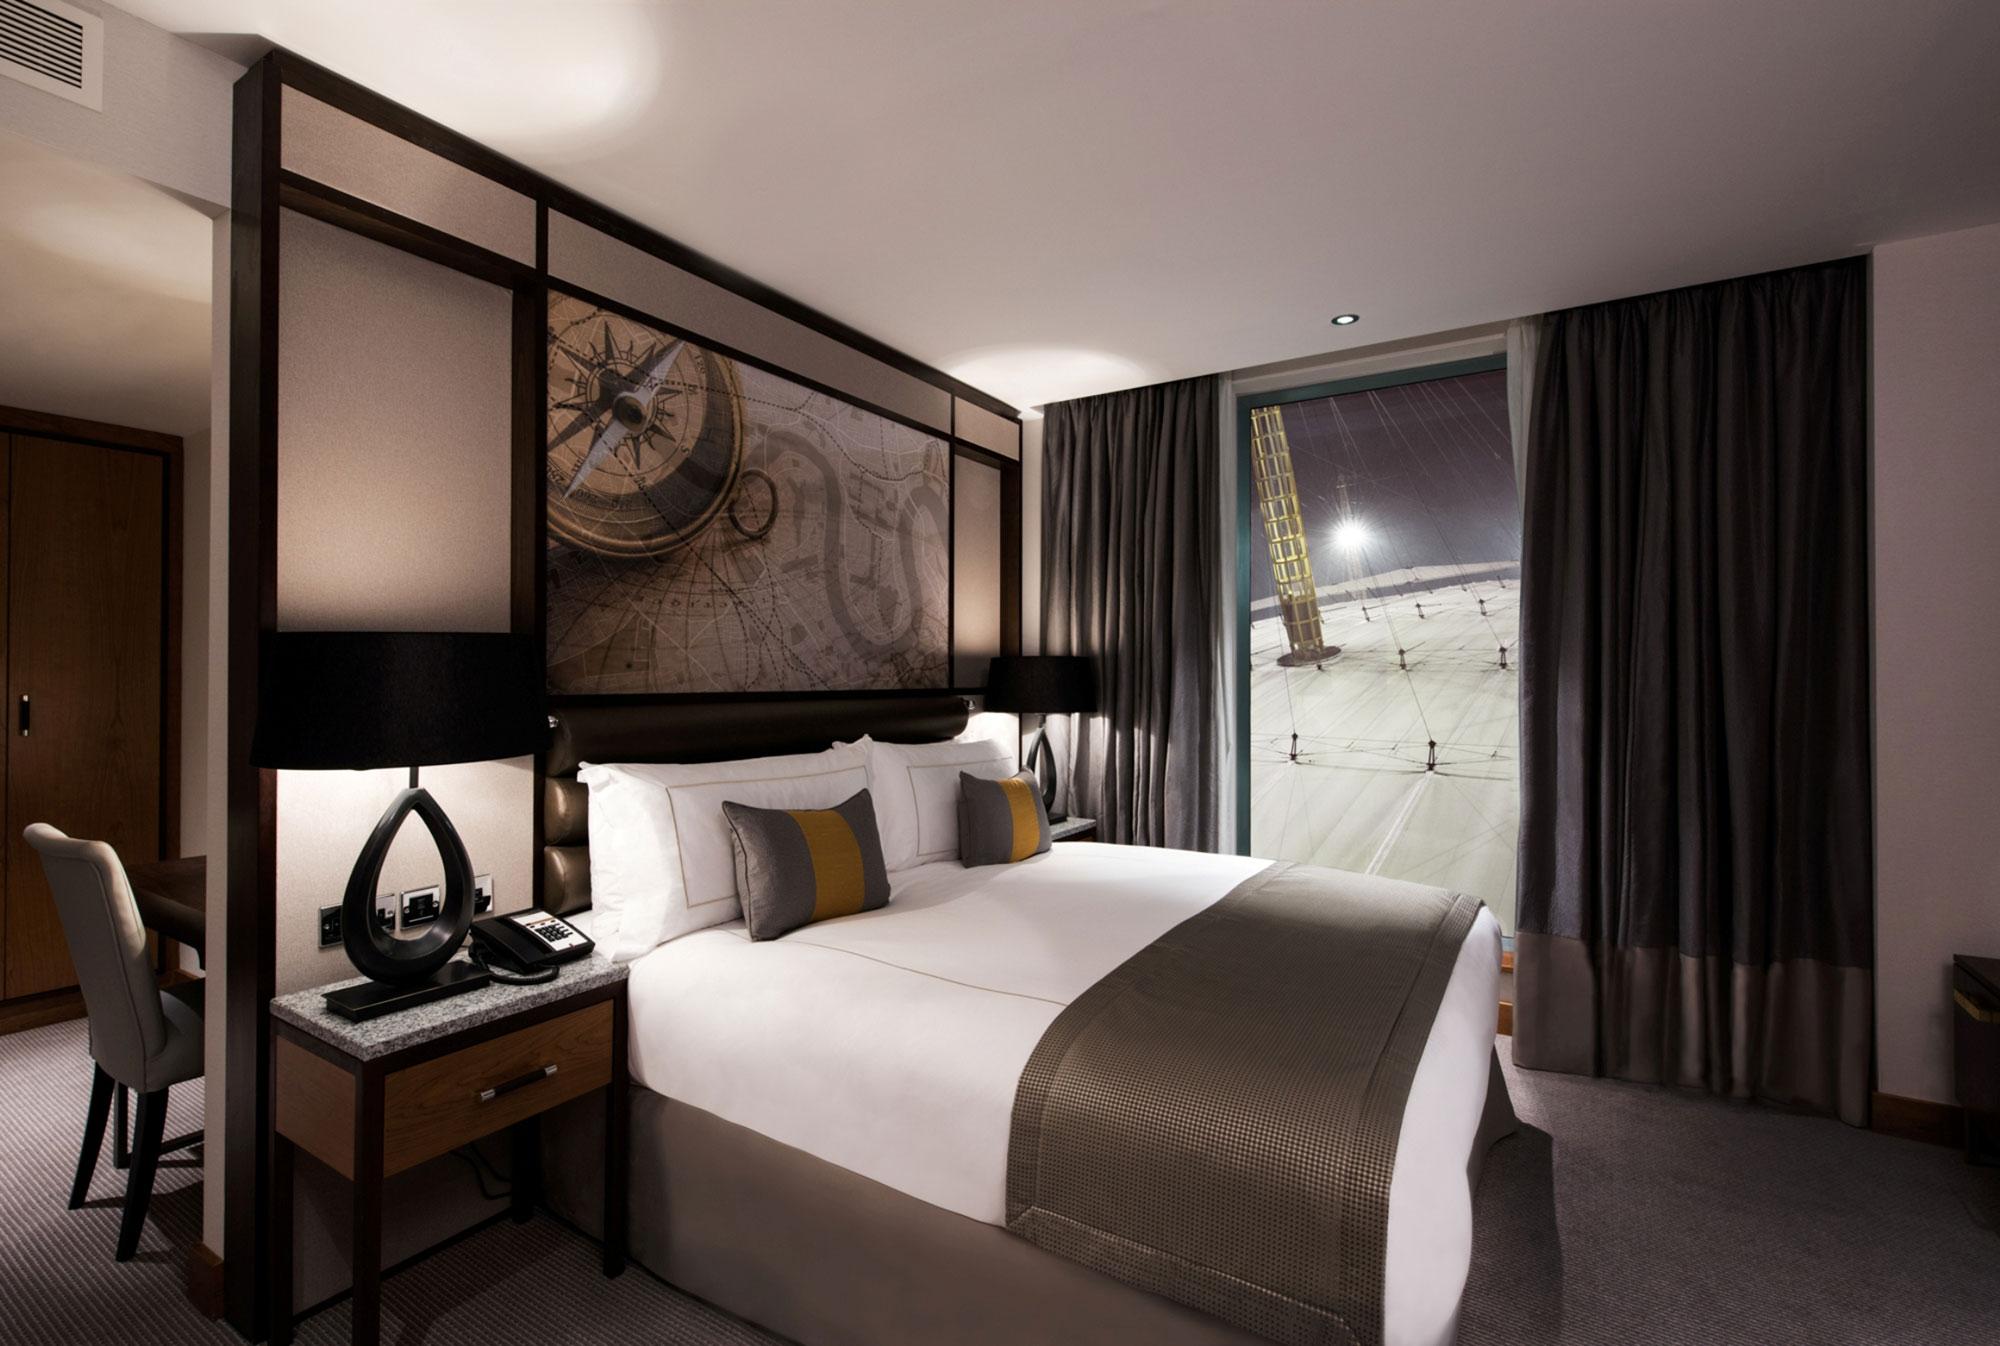 intercontinental-hotel.jpg